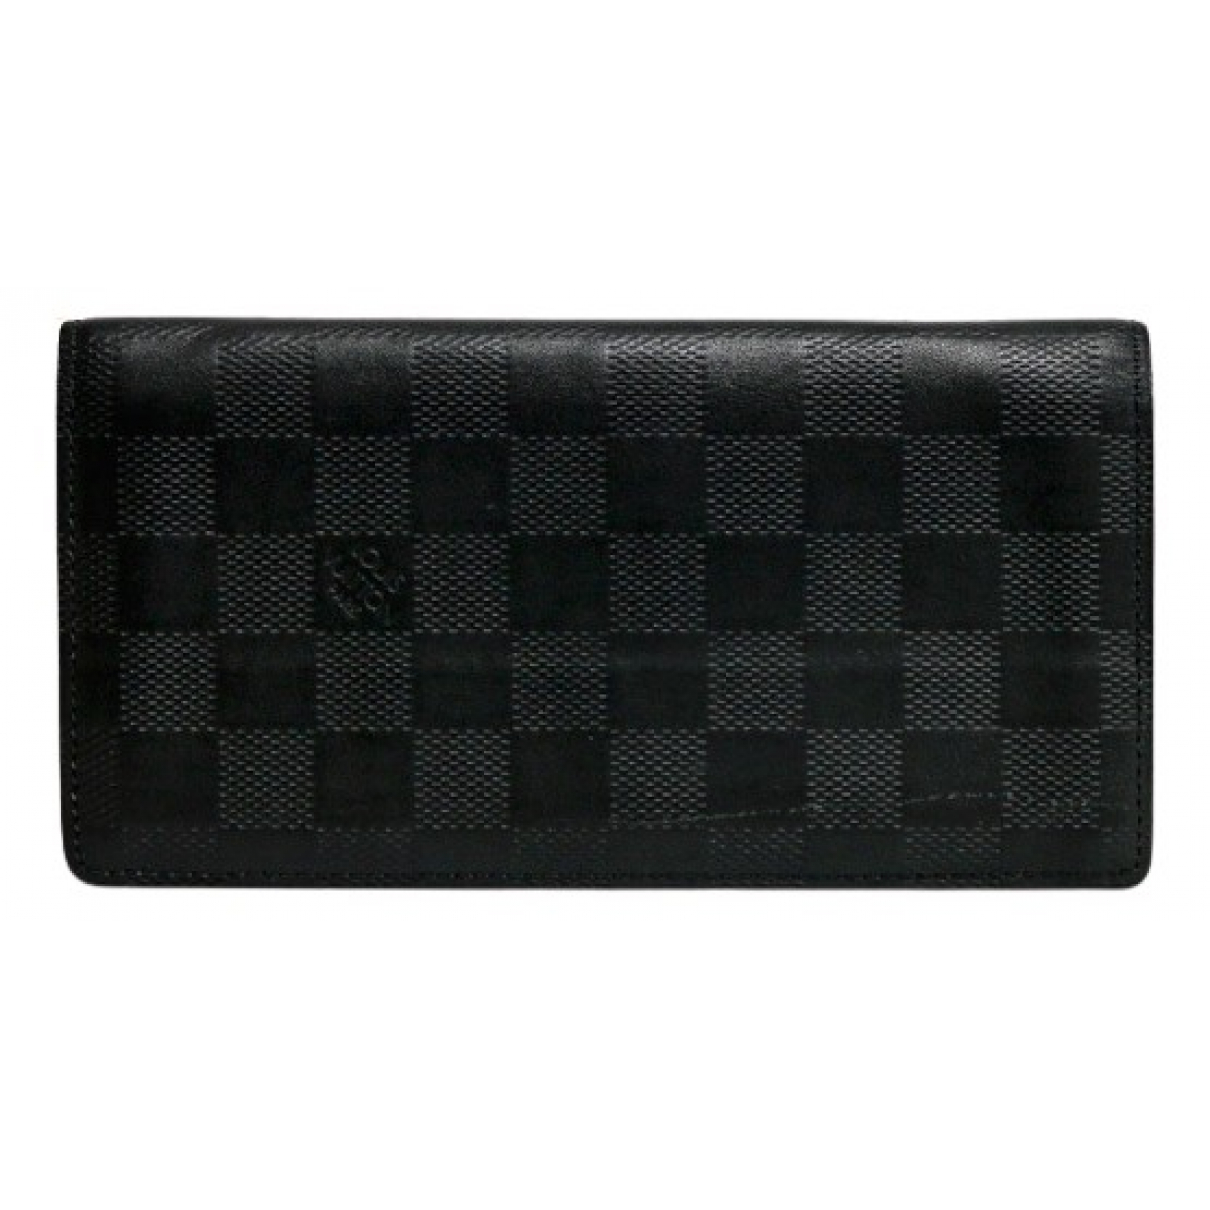 Louis Vuitton N Black Cloth Small bag, wallet & cases for Men N